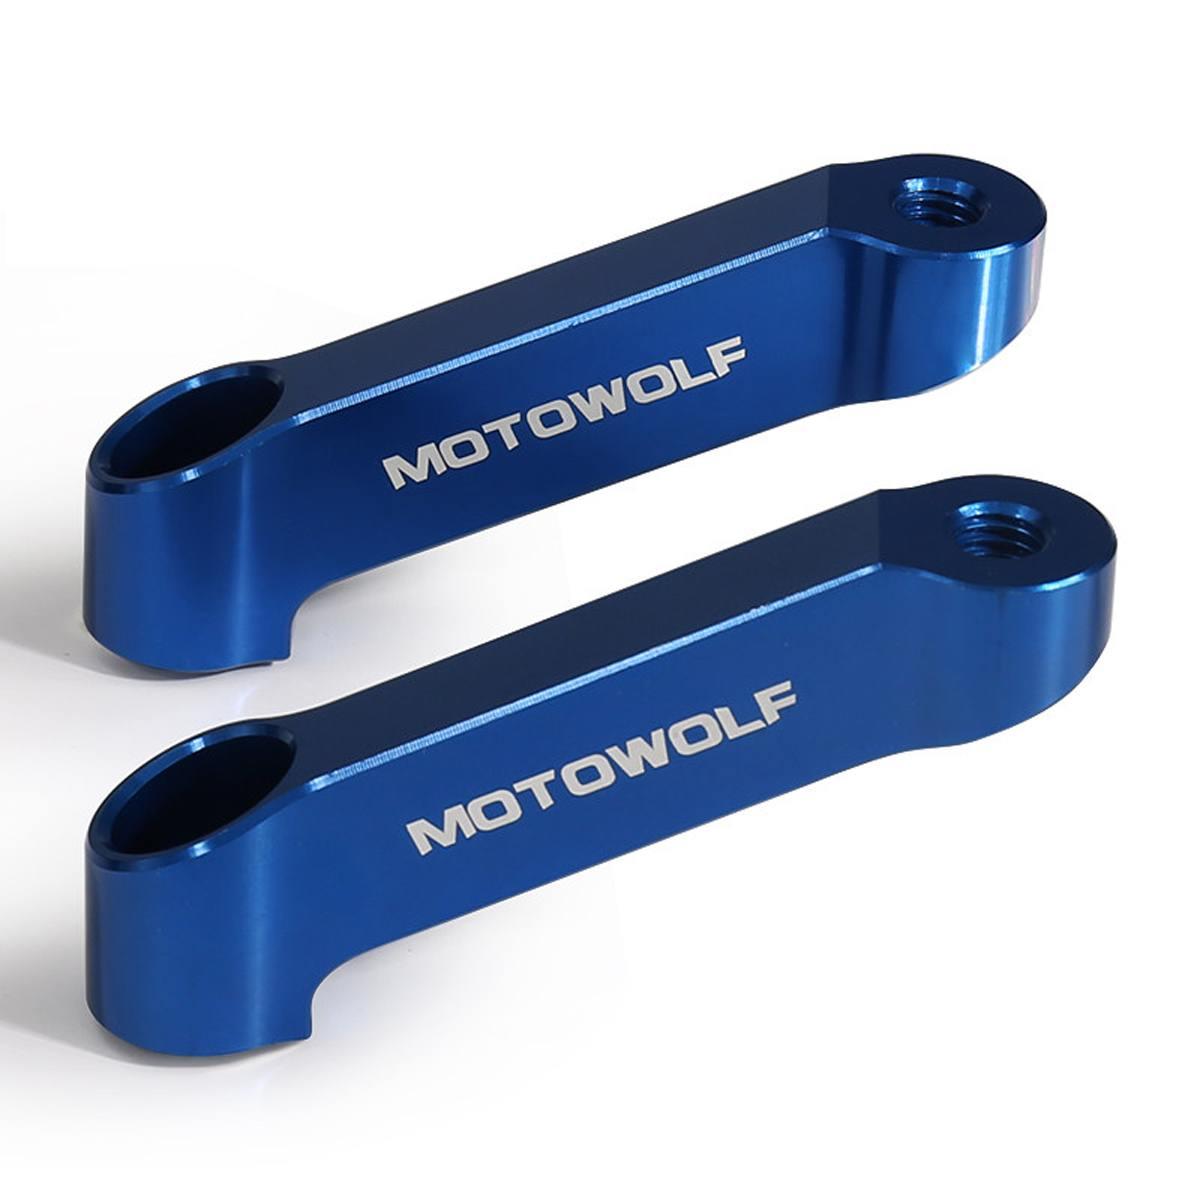 Motorcycle-Rearview-Mirror-Extension-Mount-Bracket-Holder-Universal-8-10mm-Motorbike-Rear-view-Mirror-Extension-Bracket-23